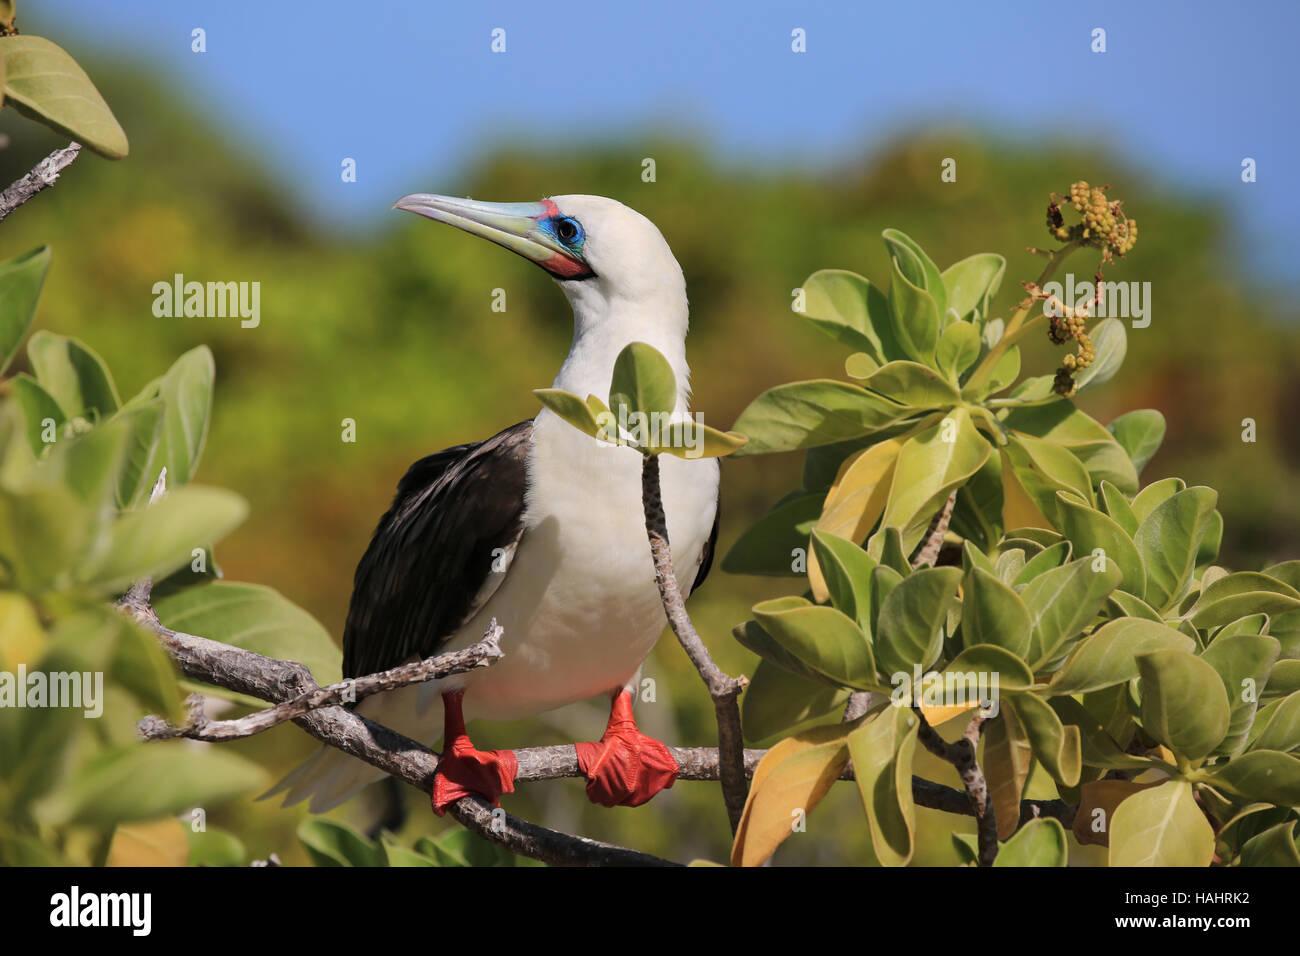 Red-footed Booby bird, Christmas (Kiritimati) Island, Kiribati - Stock Image